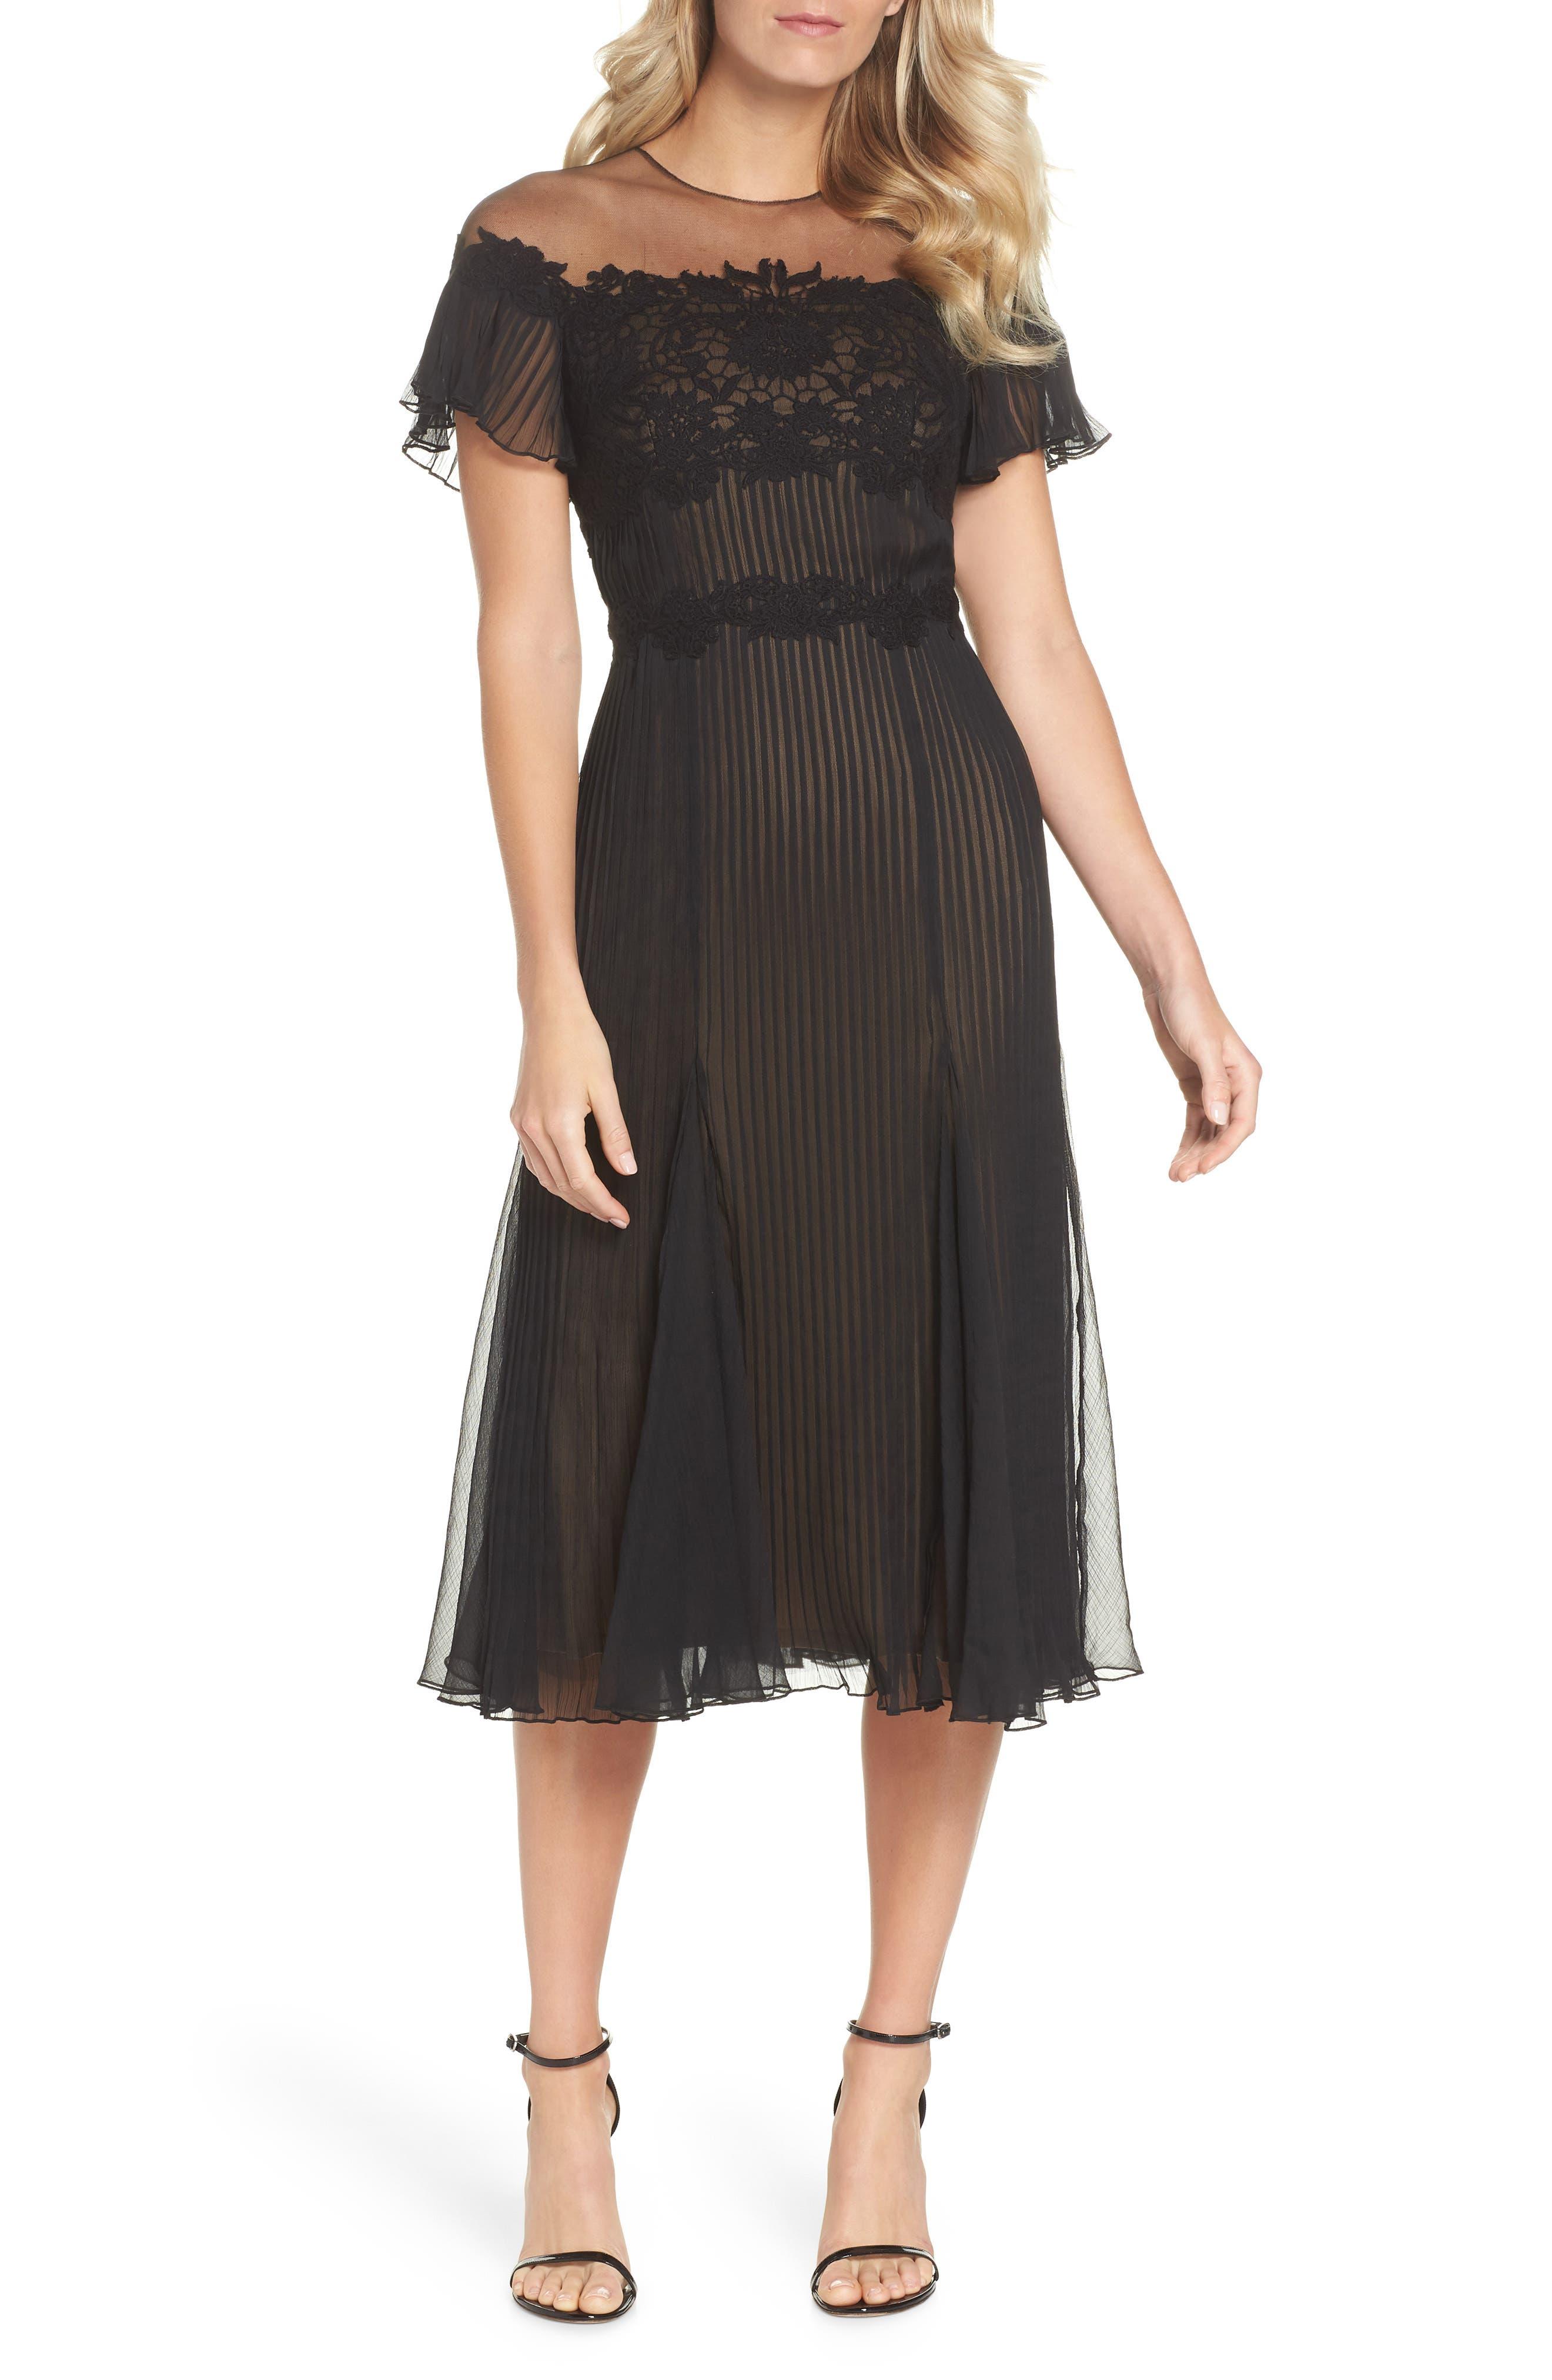 TADASHI SHOJI Lace & Chiffon A-Line Dress, Main, color, 004